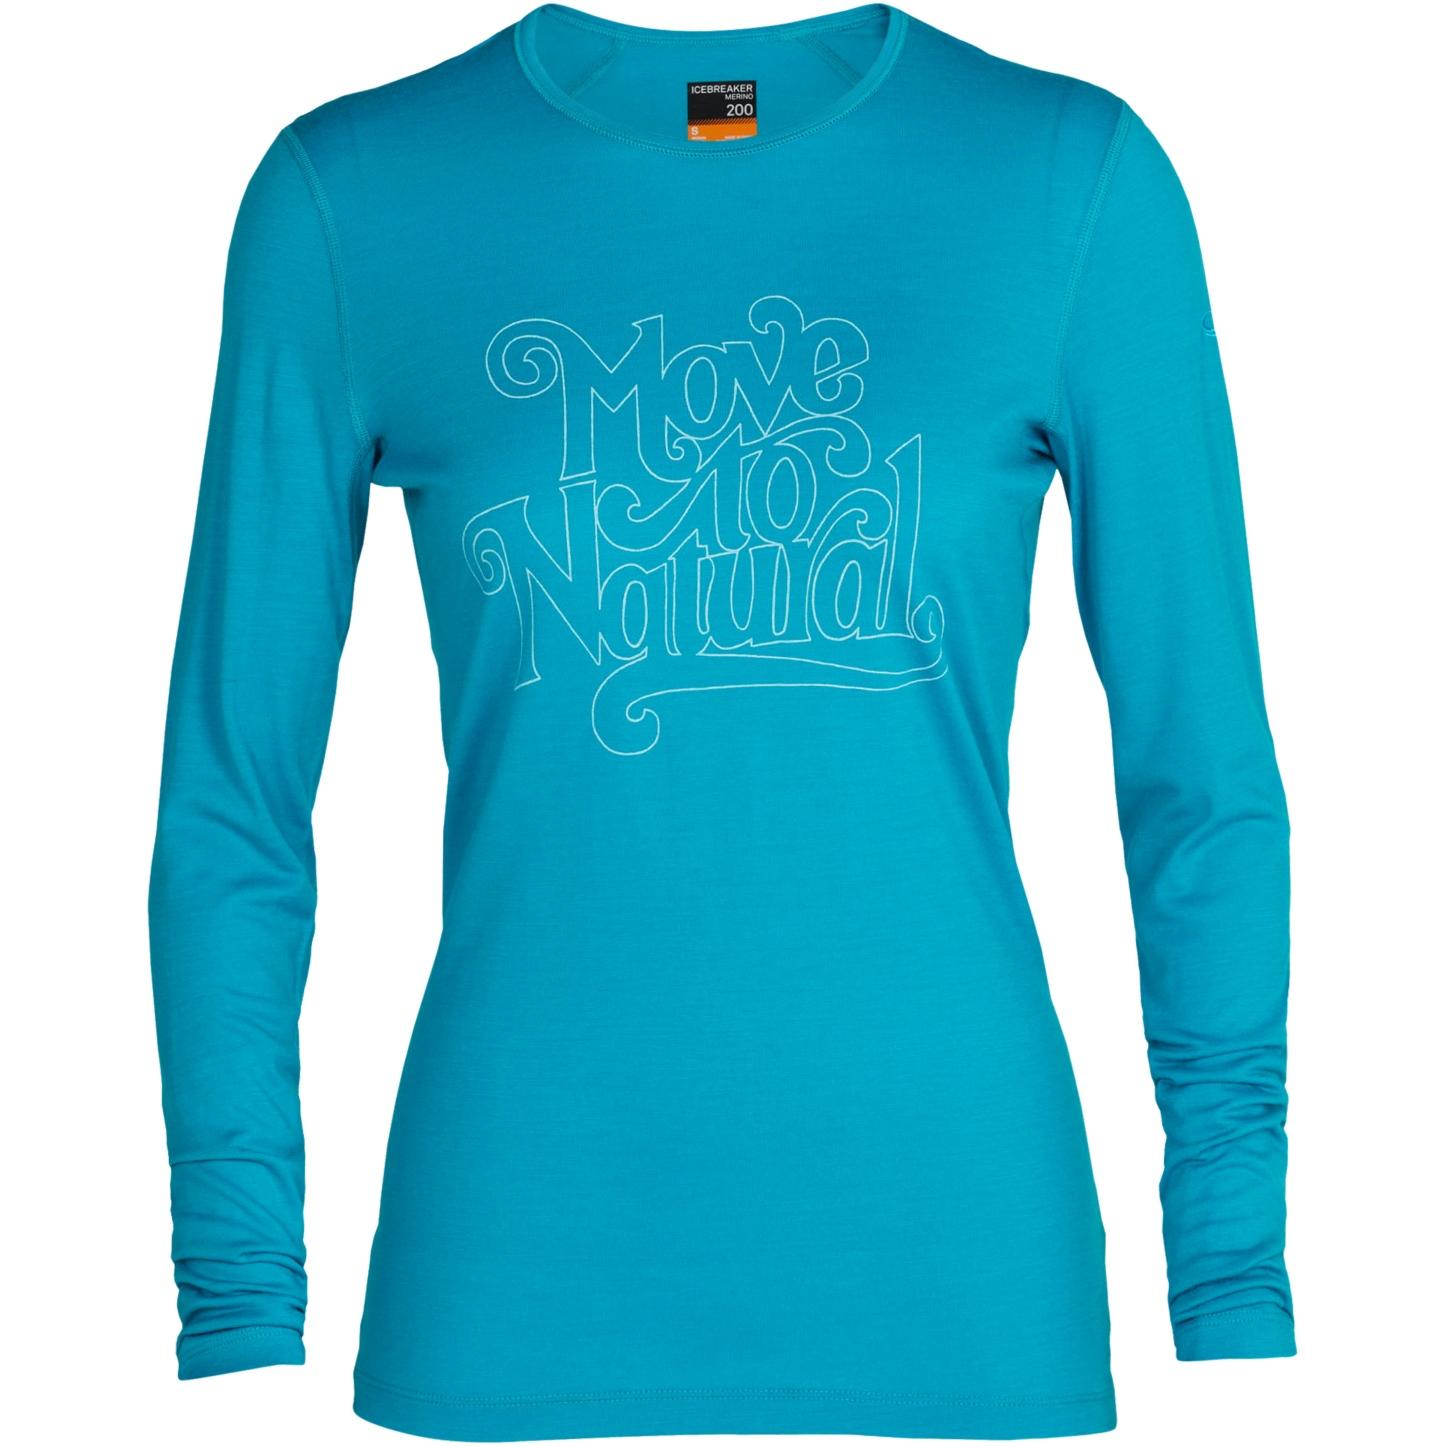 Produktbild von Icebreaker 200 Oasis Crewe Move to Natural Damen Langarmshirt - Arctic Teal